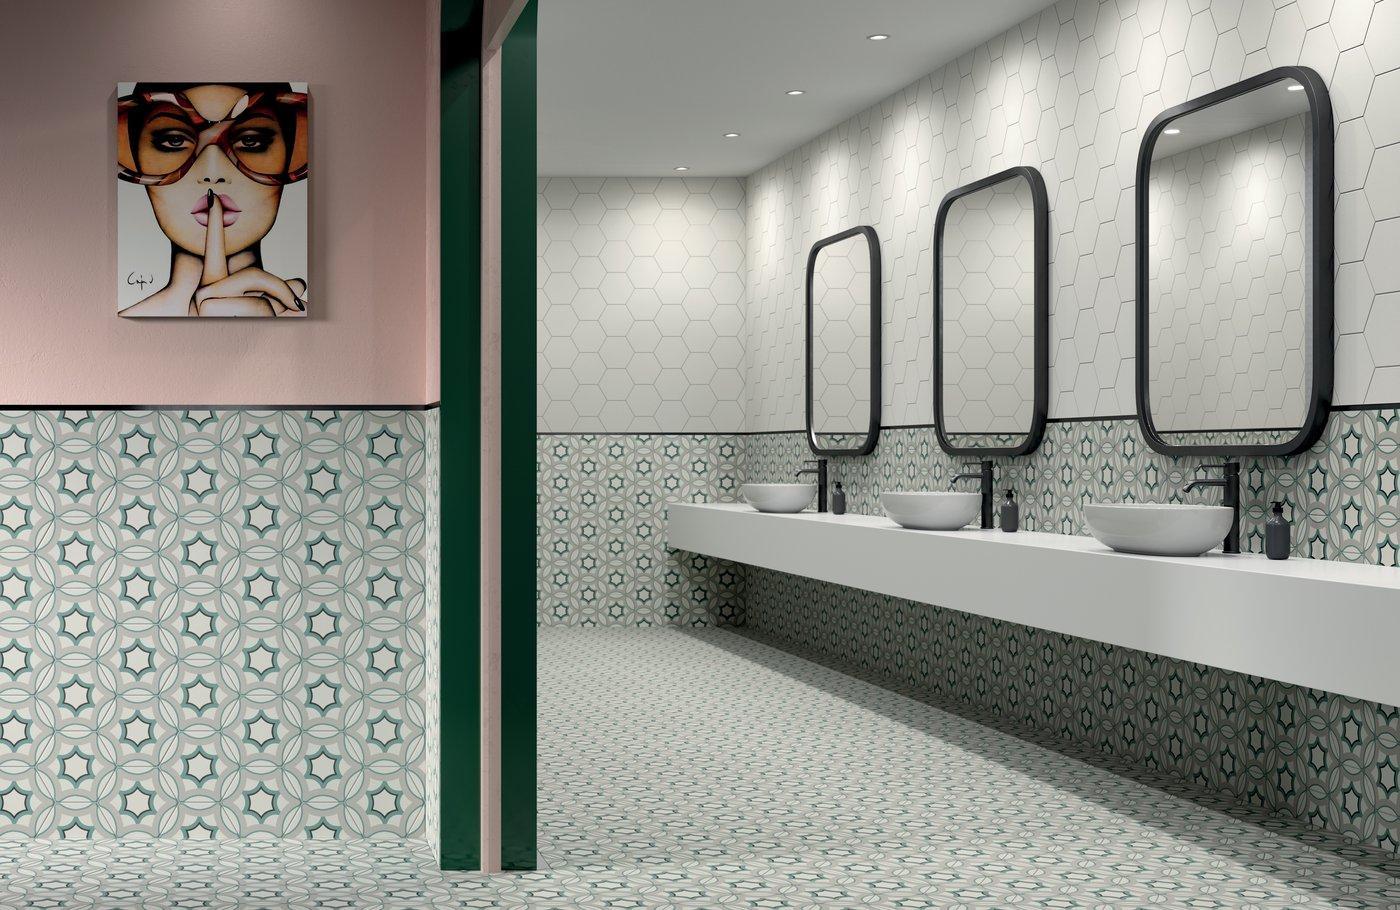 Zelená v kúpeľni - Obrázok č. 25